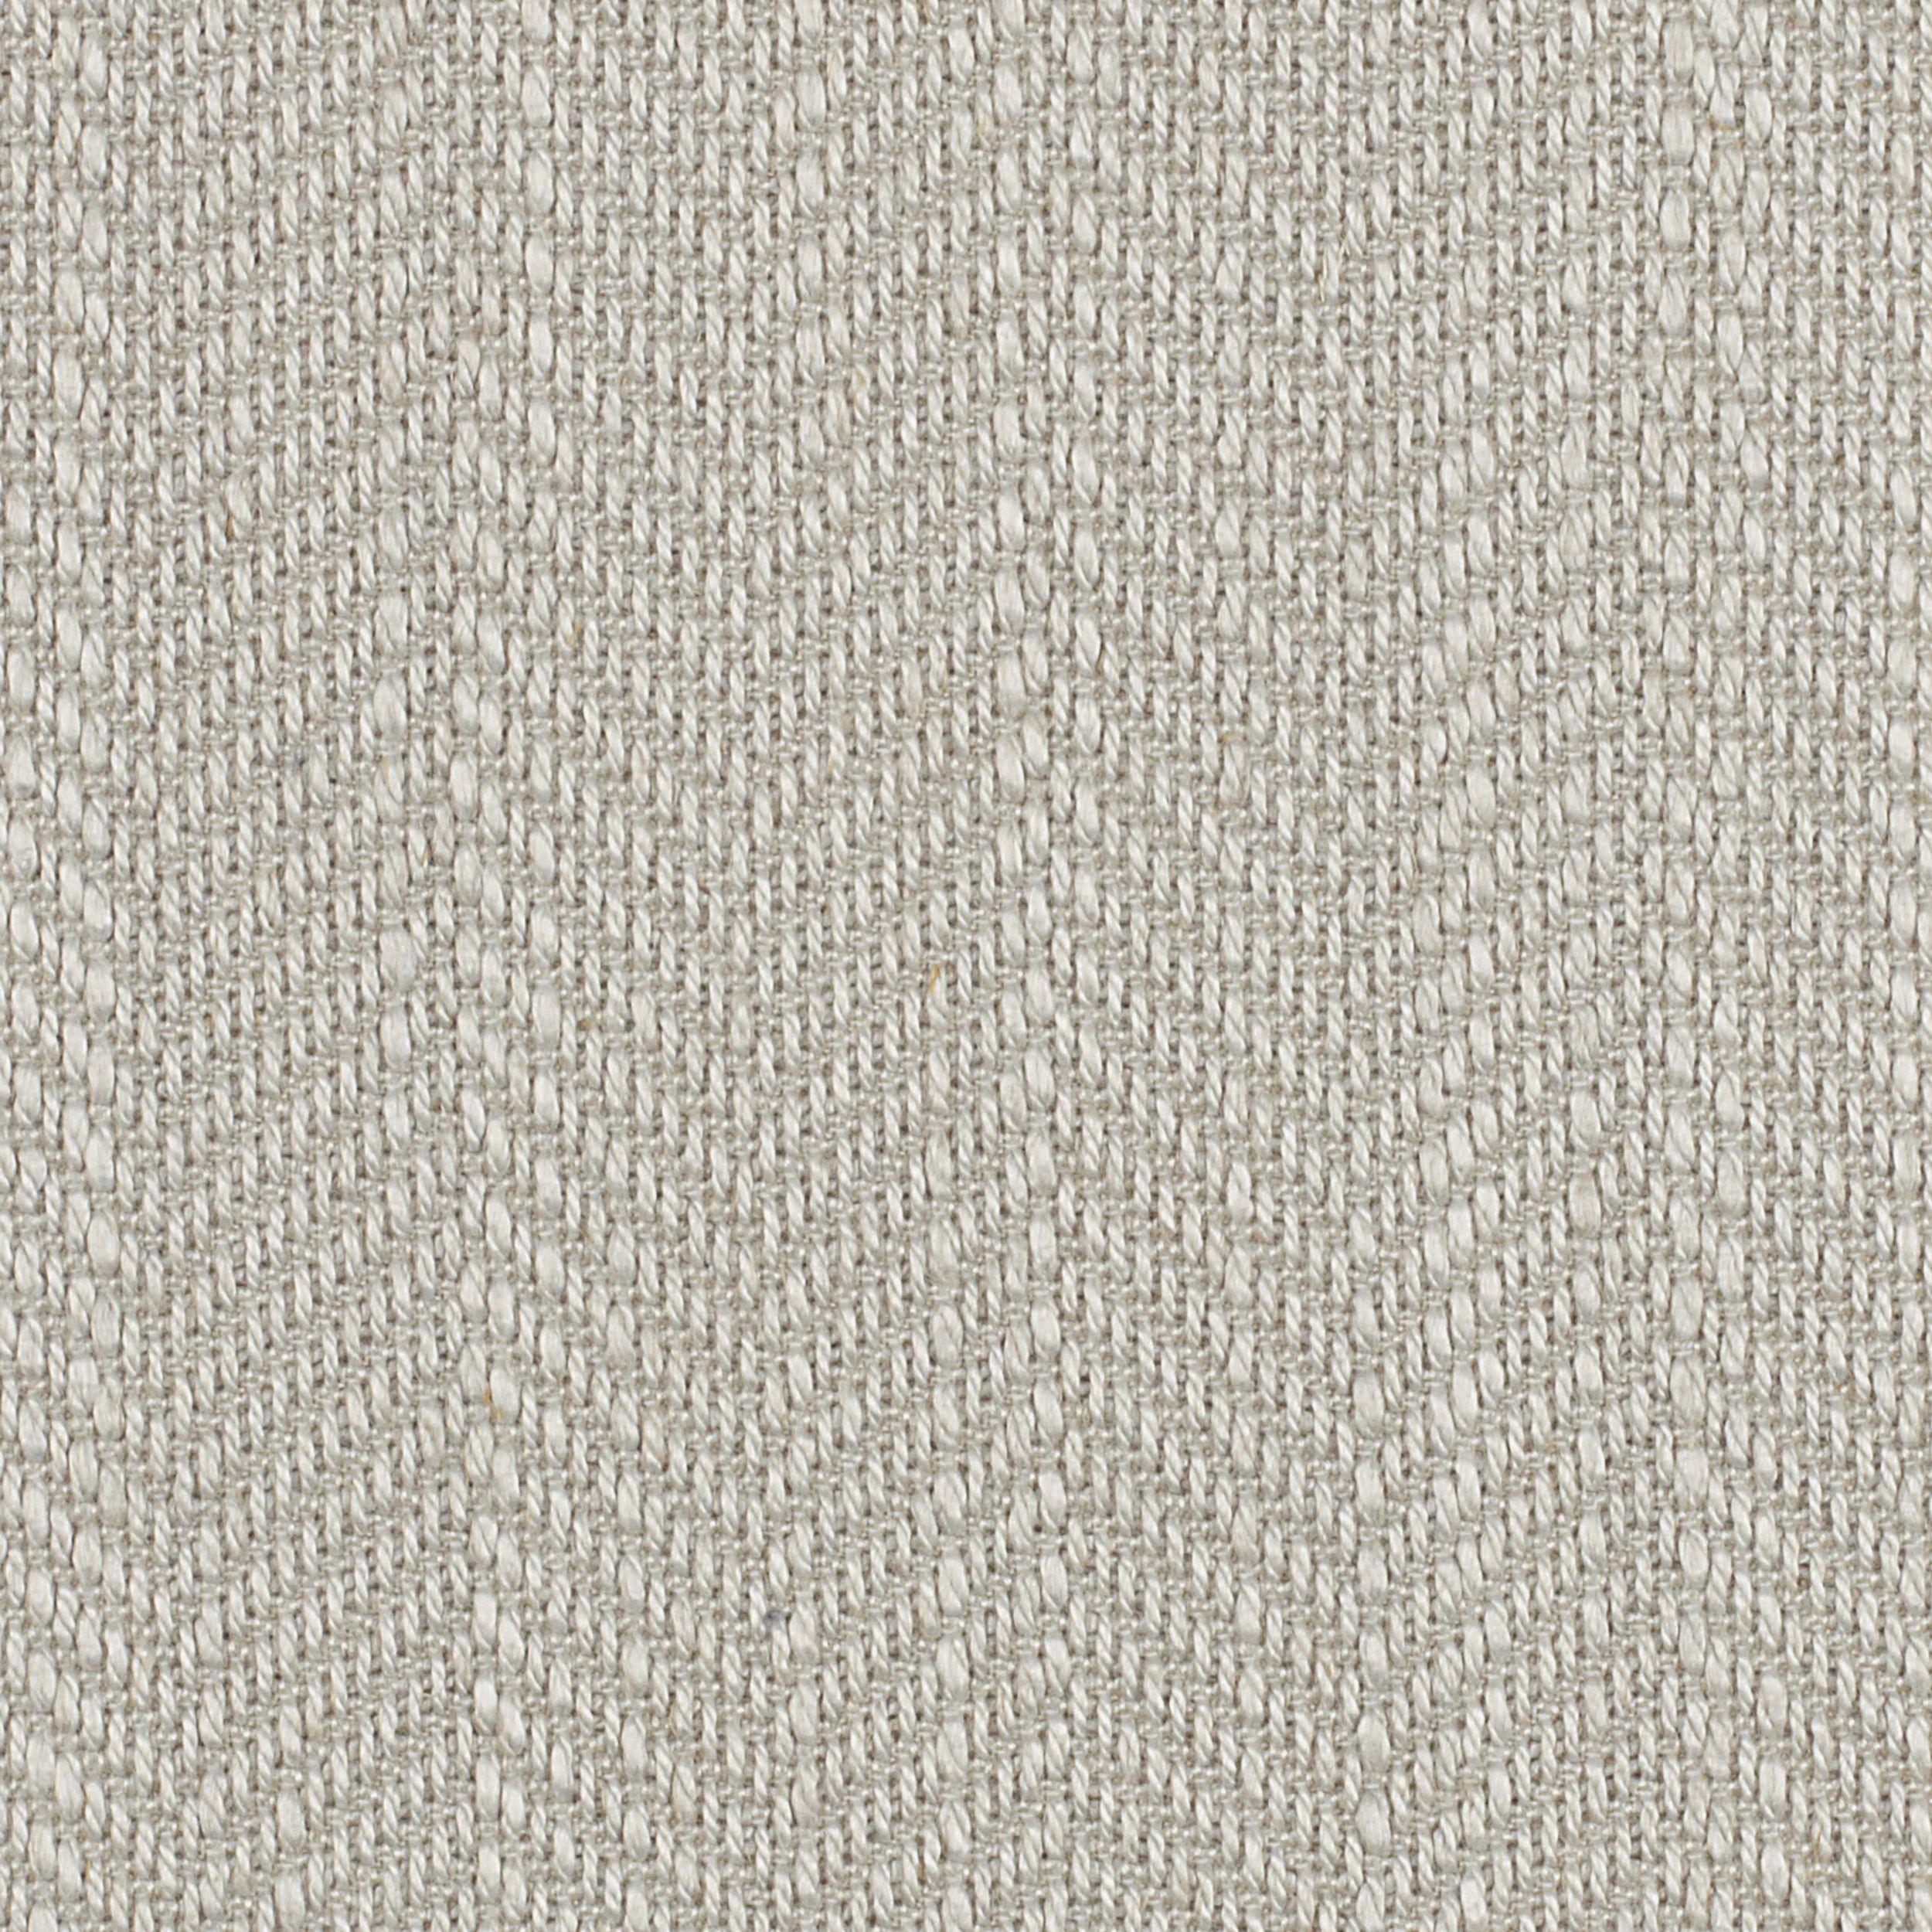 Edwin dove grey upholstery fabric cabecera de la cama - Telas laura ashley ...